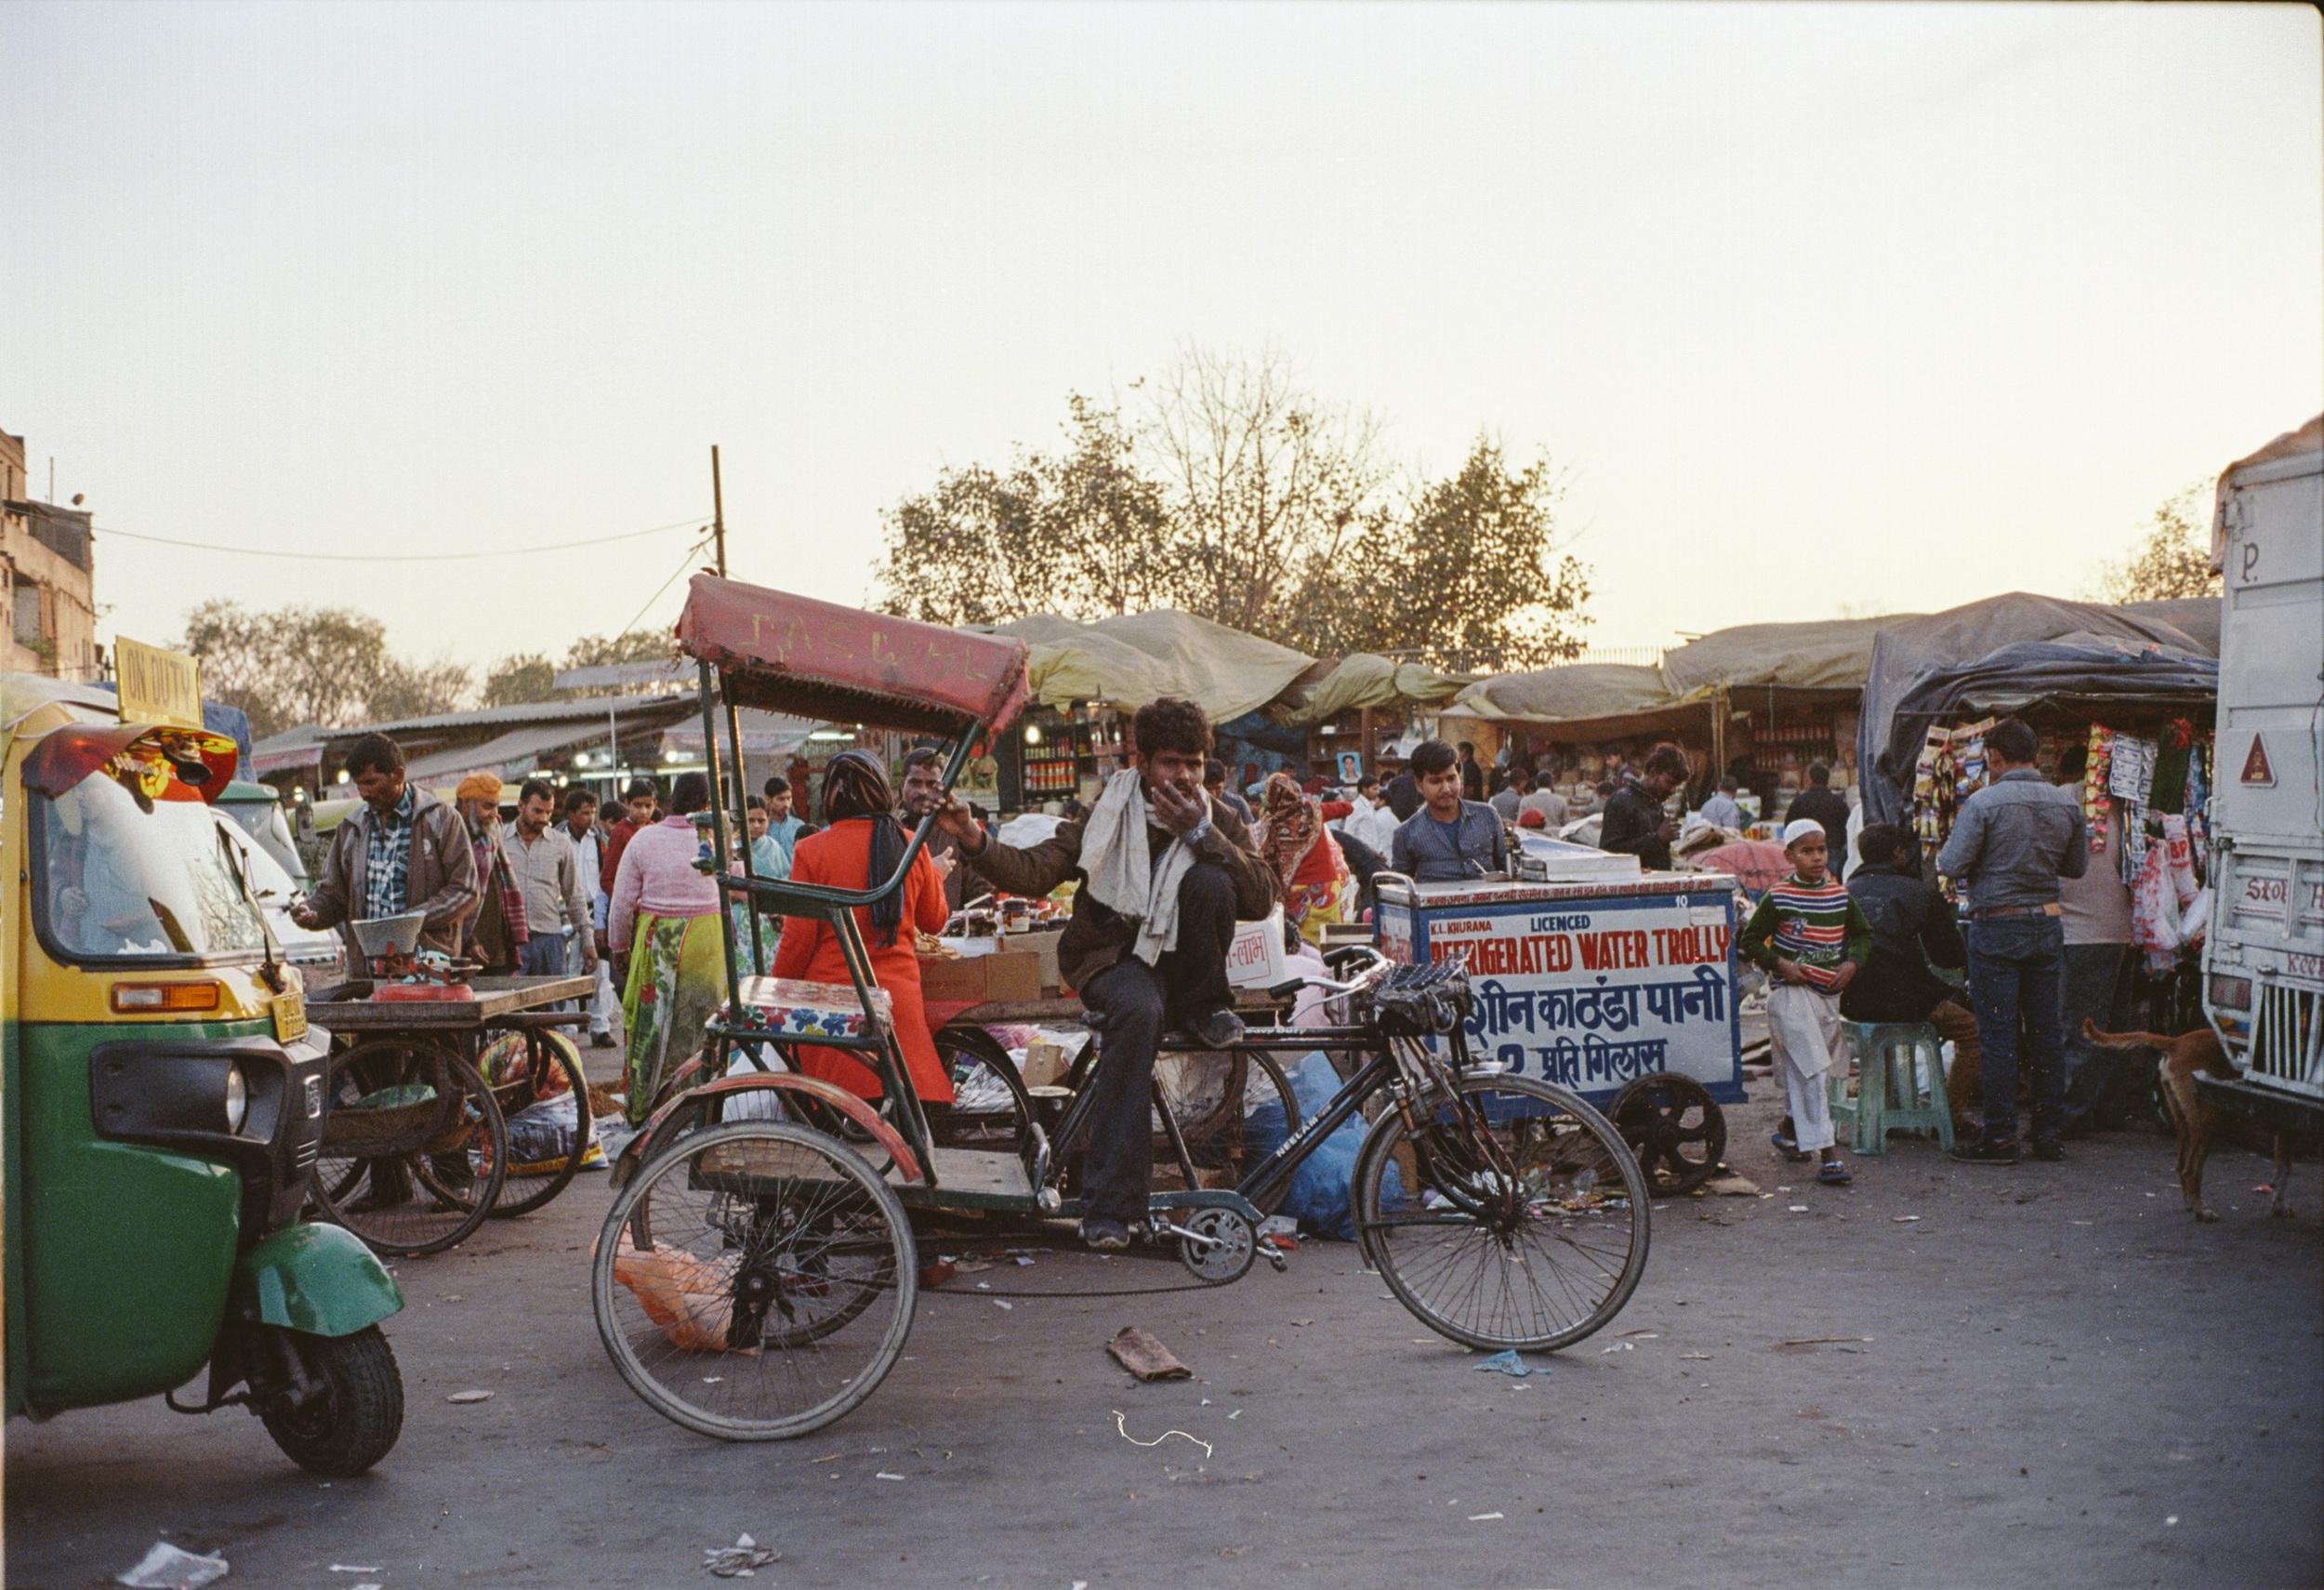 72-F31_Spice Market, Delhi, India 2016-5.jpg